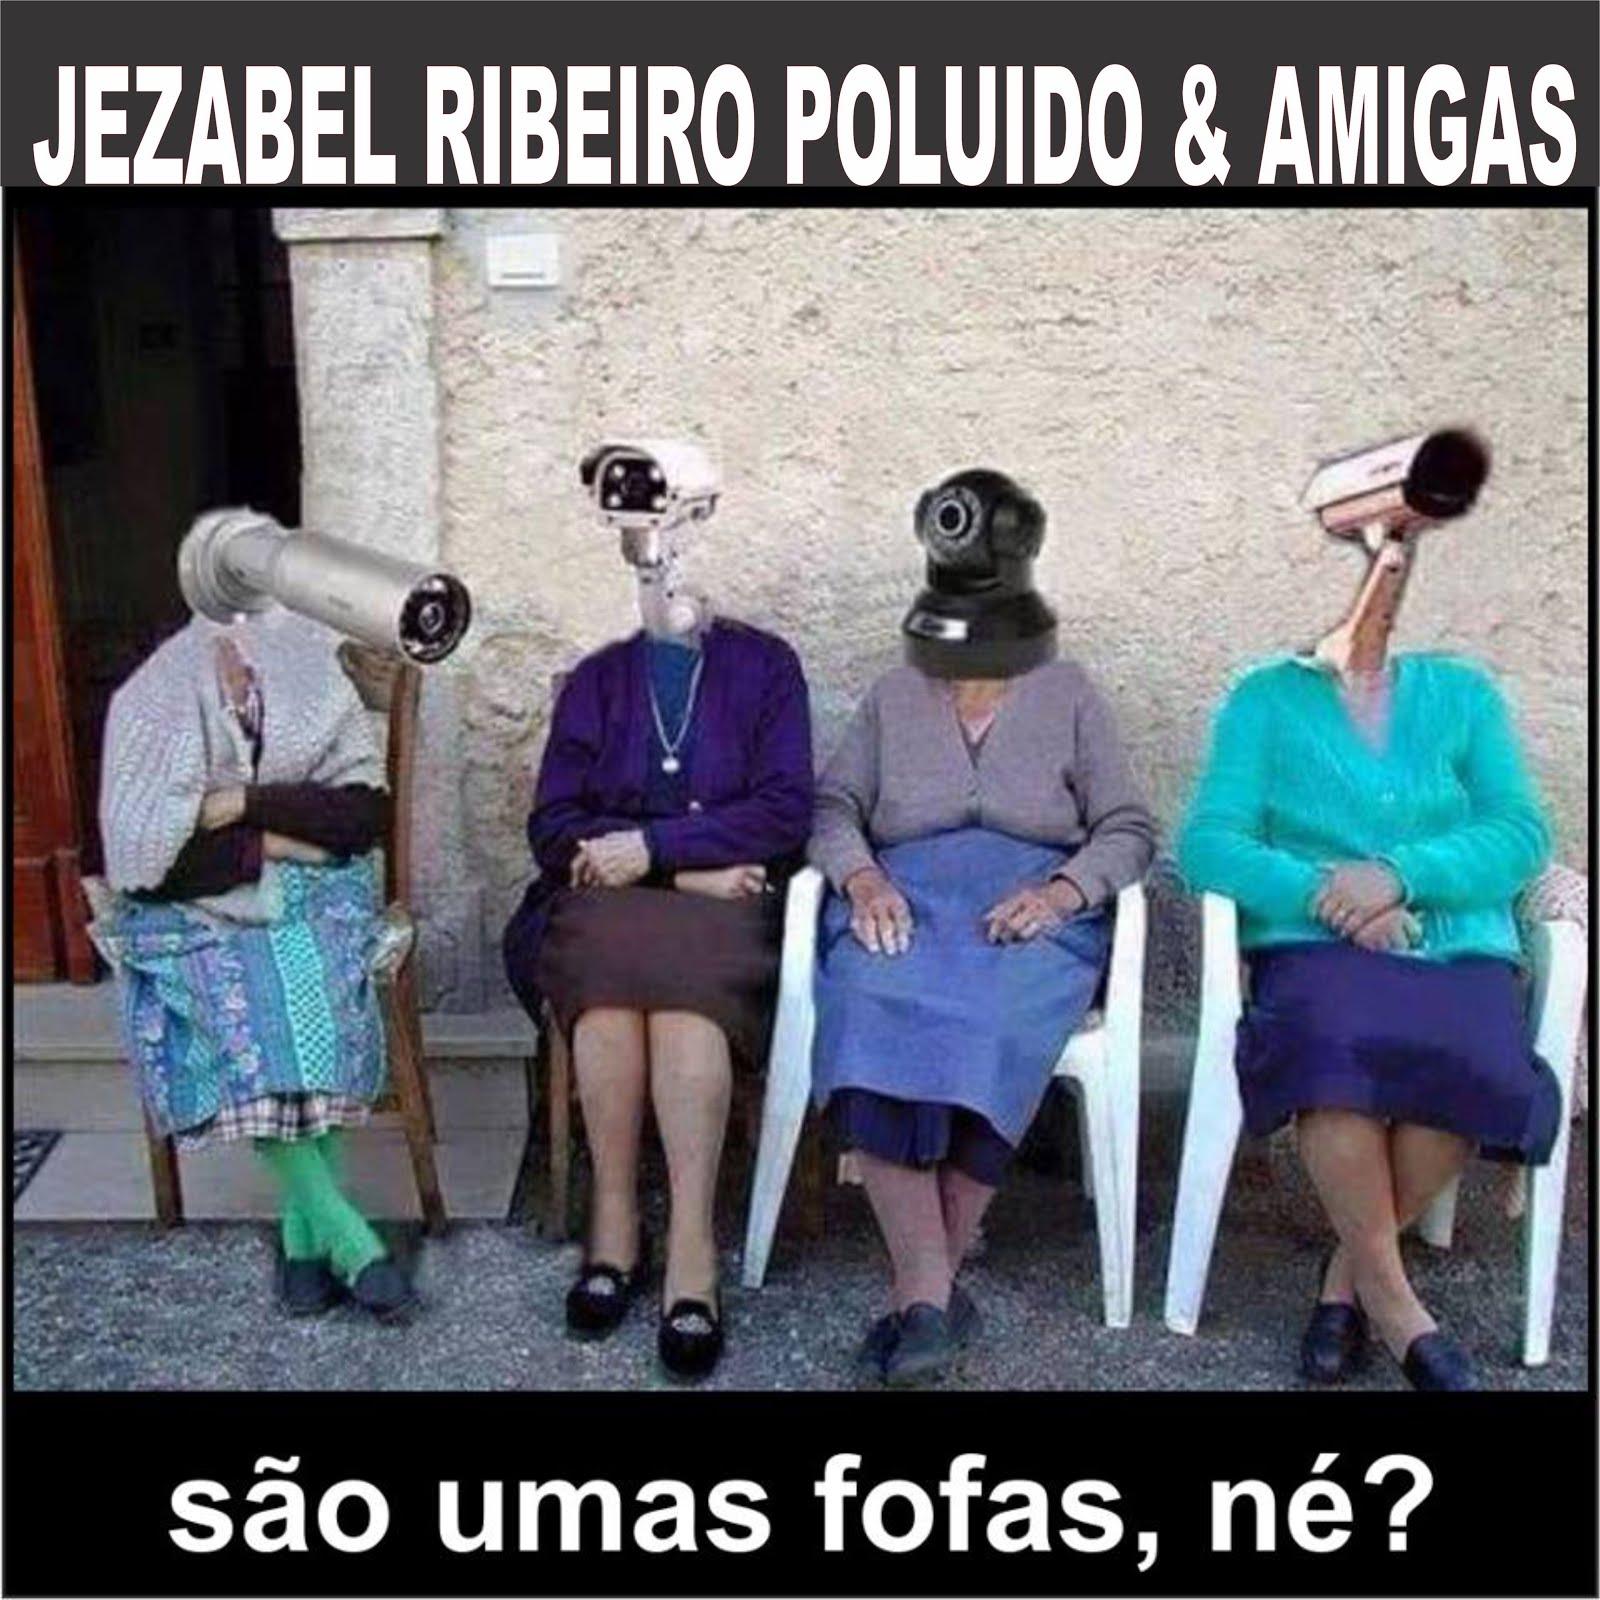 JEZABEL DILMA RIBEIRO POLUIDO